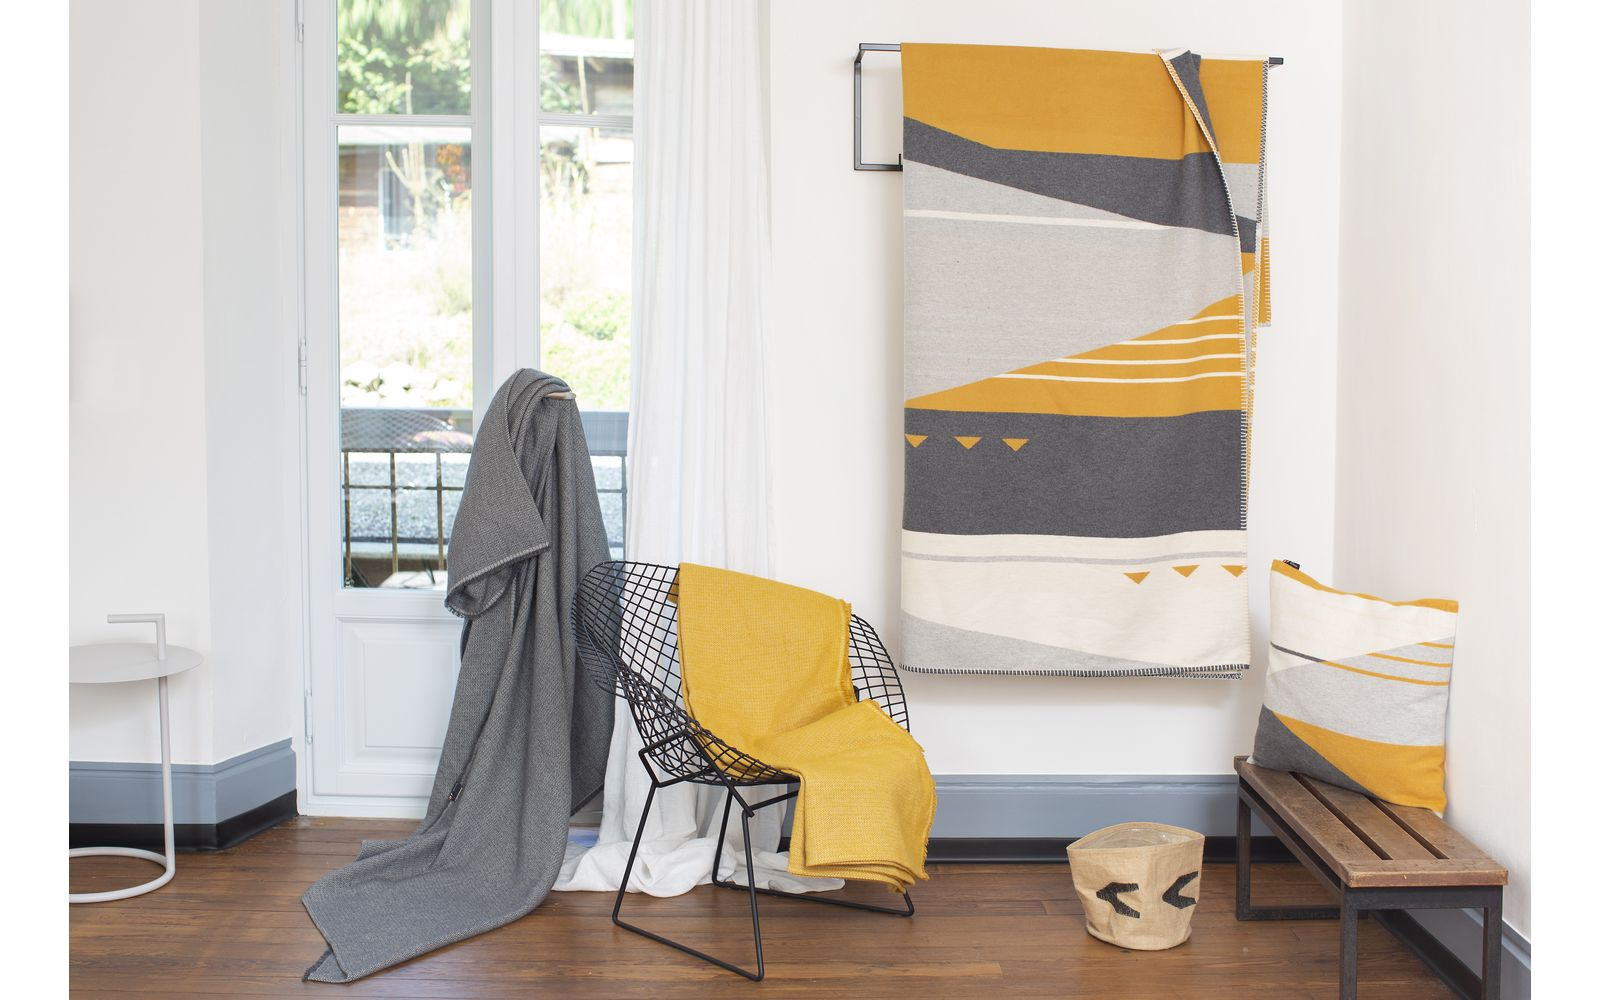 JADE throw 100% organic cotton (GOTS), graphic-lines